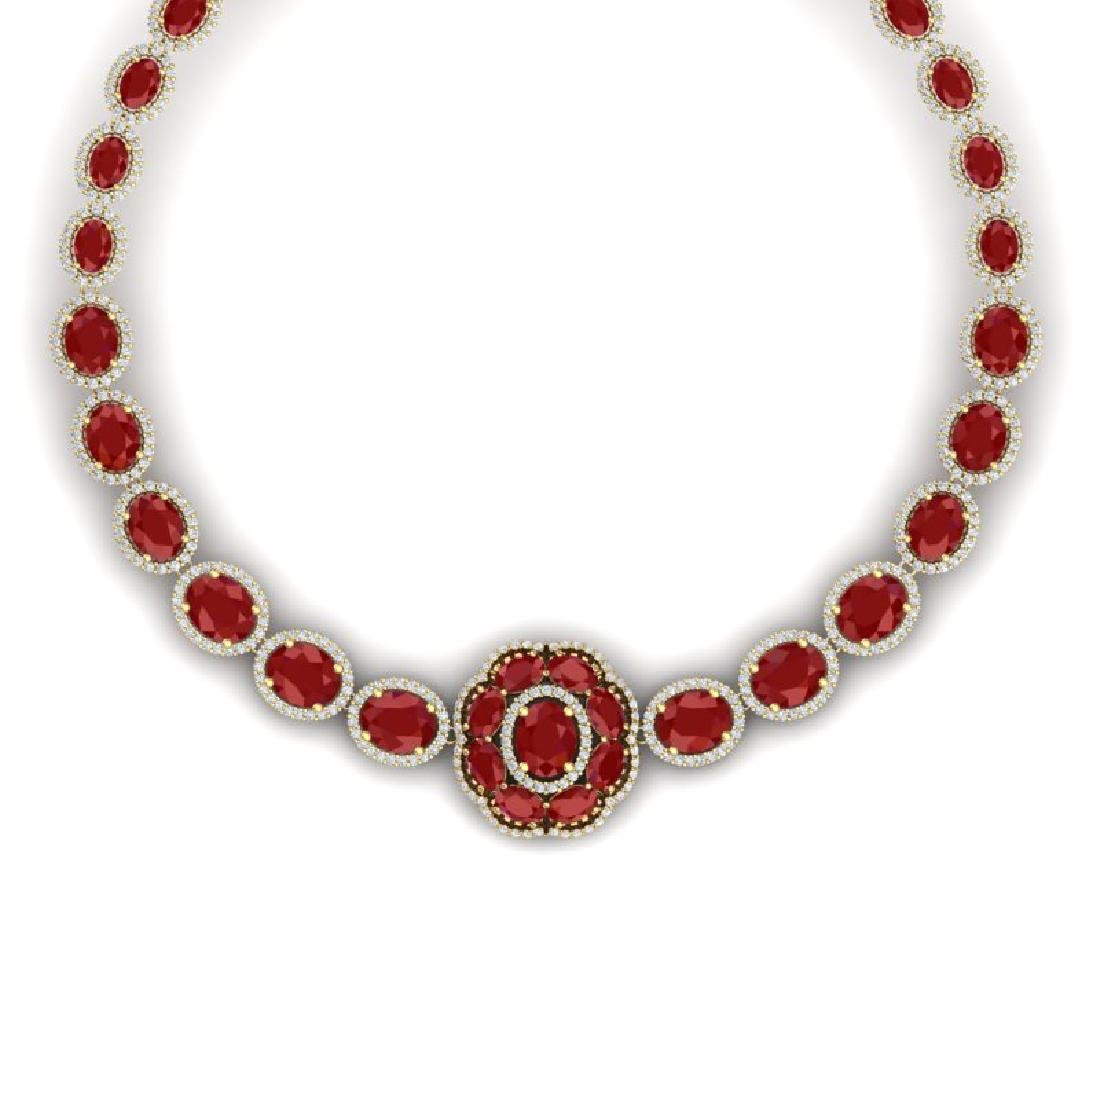 58.33 CTW Royalty Ruby & VS Diamond Necklace 18K Yellow - 2